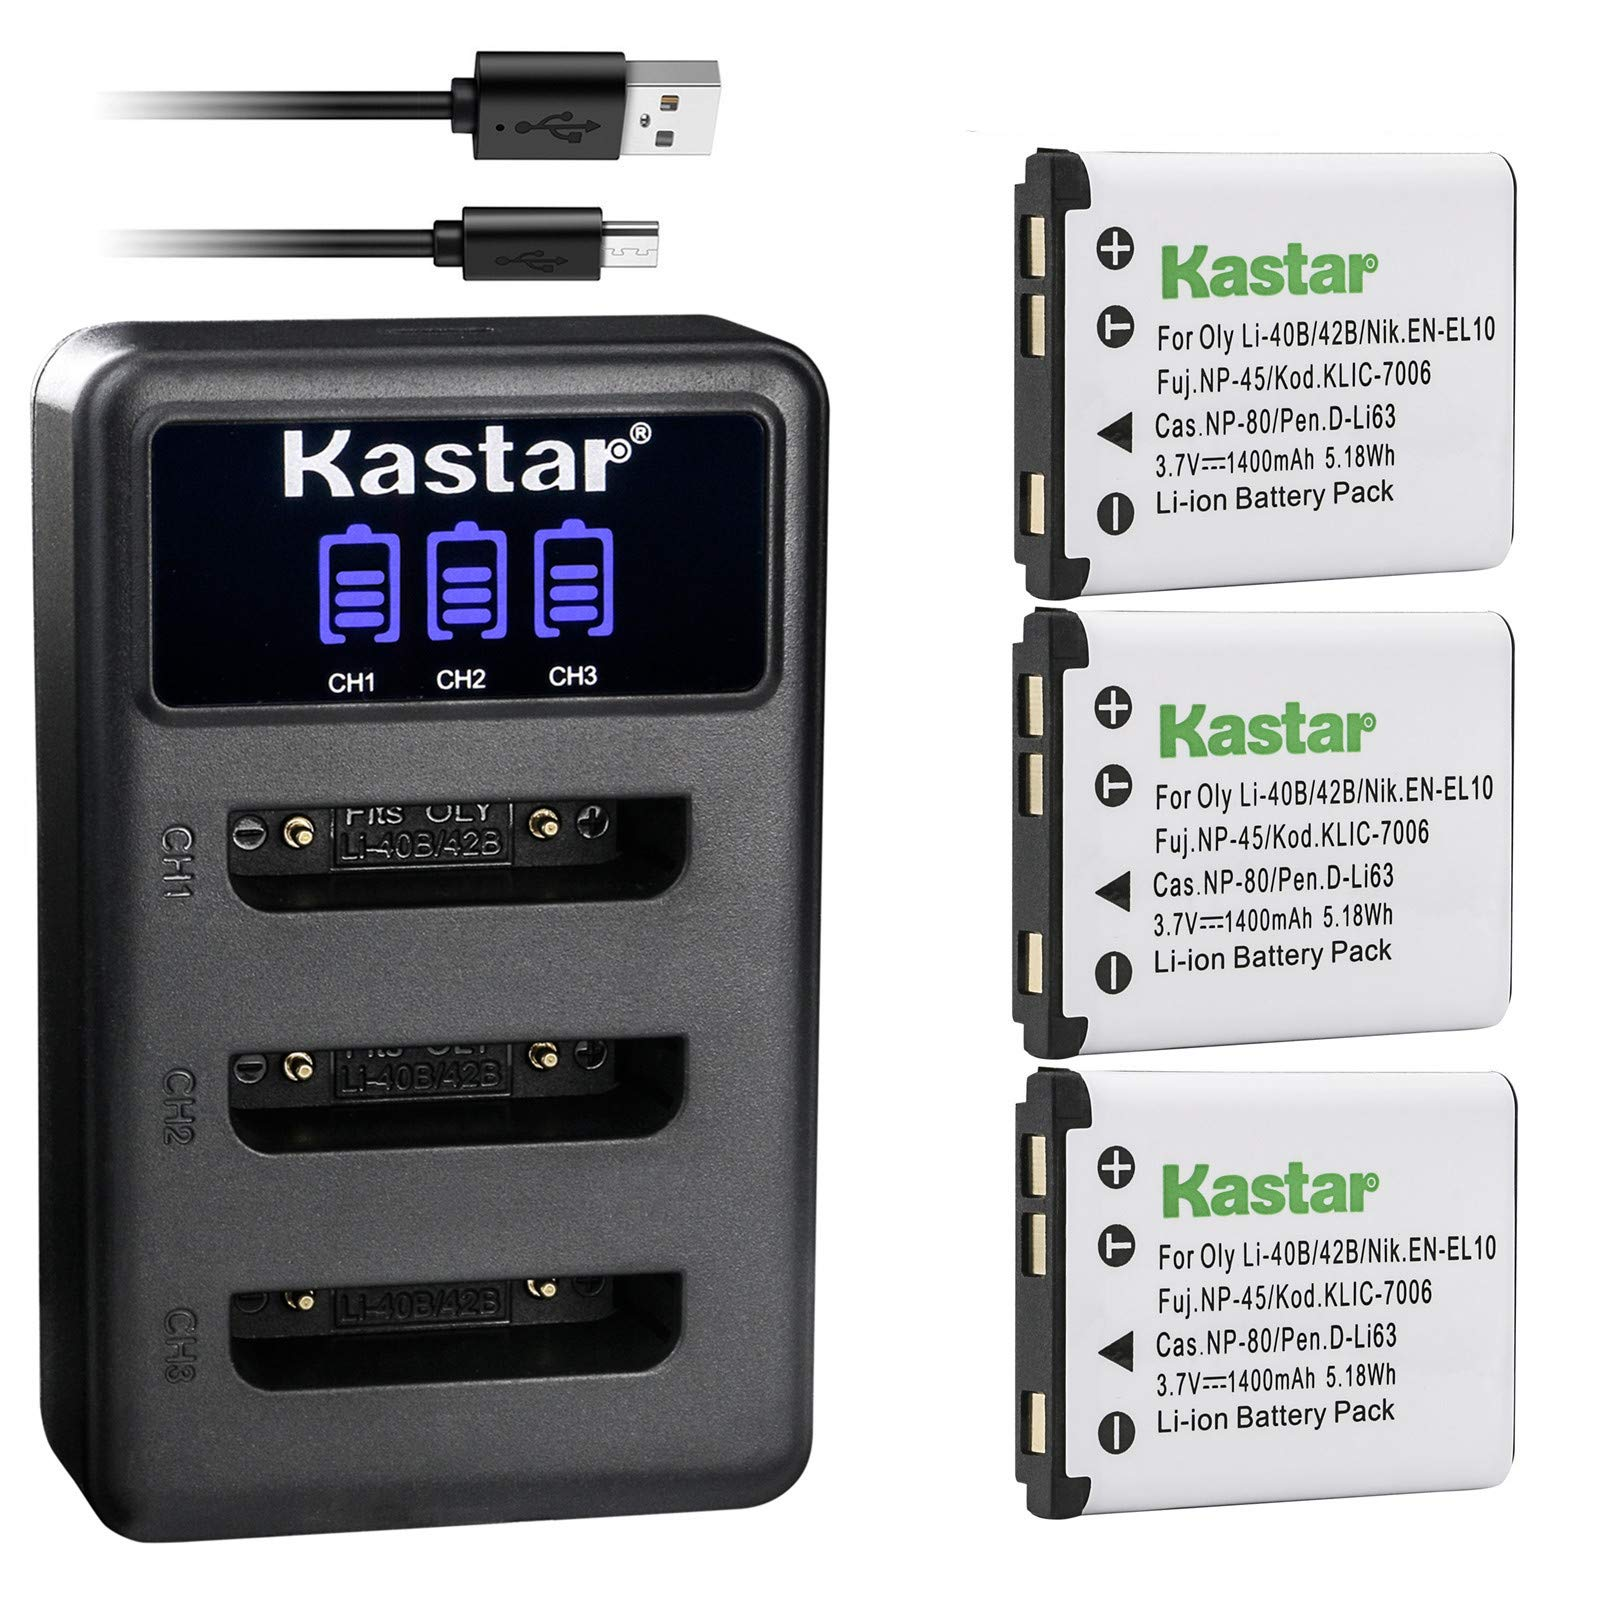 Kastar Battery 3-Pack + LCD Triple Charger Replacement for Olympus LI-42B LI-40B, Fujifilm NP-45 NP-45A NP-45B NP-45S, Nikon EN-EL10, Kodak KLIC-7006, Casio NP-80, Pentax D-Li63 D-Li108, Ricoh DS-6365